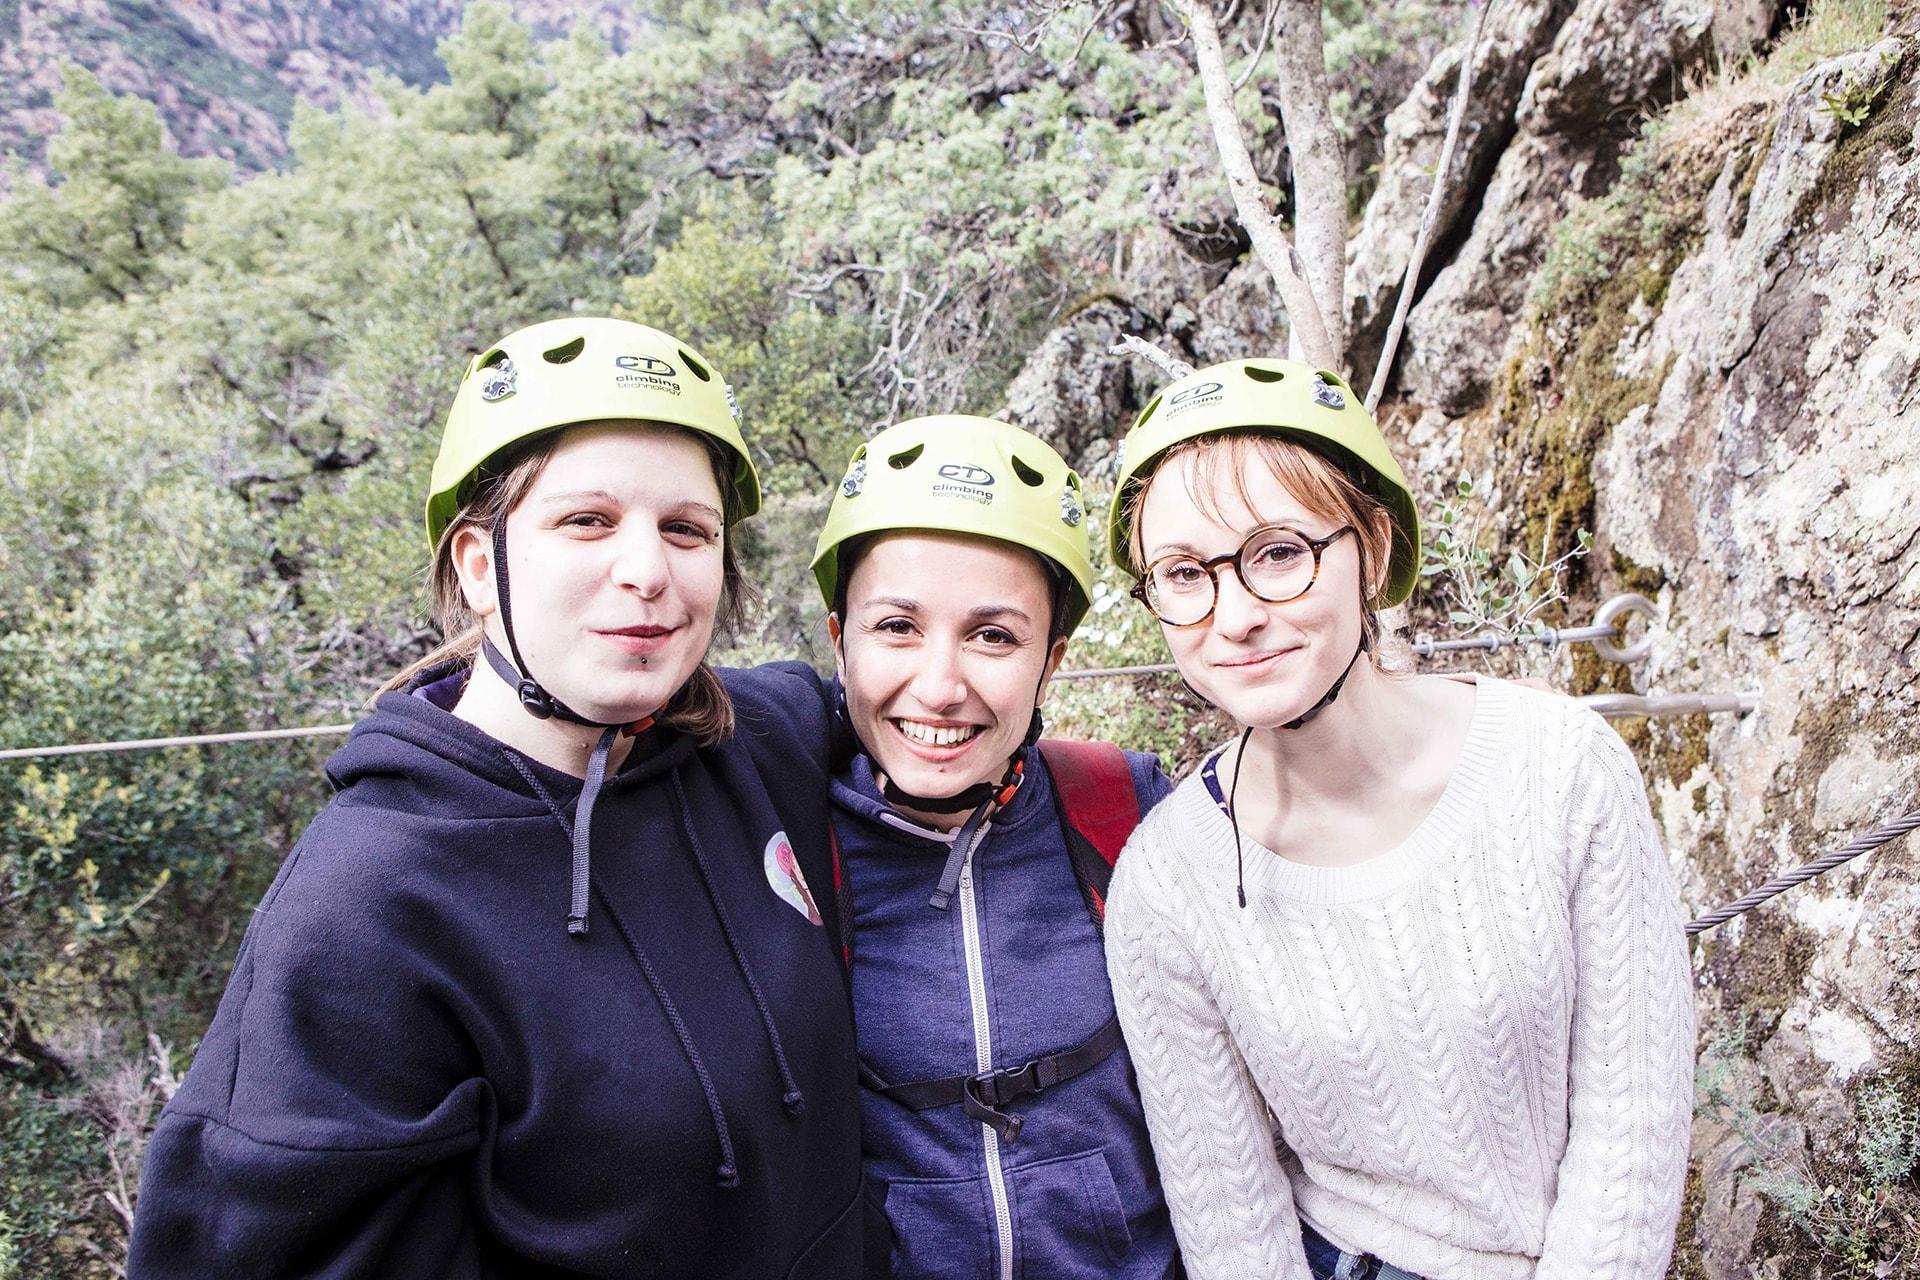 blog-voyage-sabine-kley-corse-balagne-asco-In-Terra-Corsa-tyrotrekking